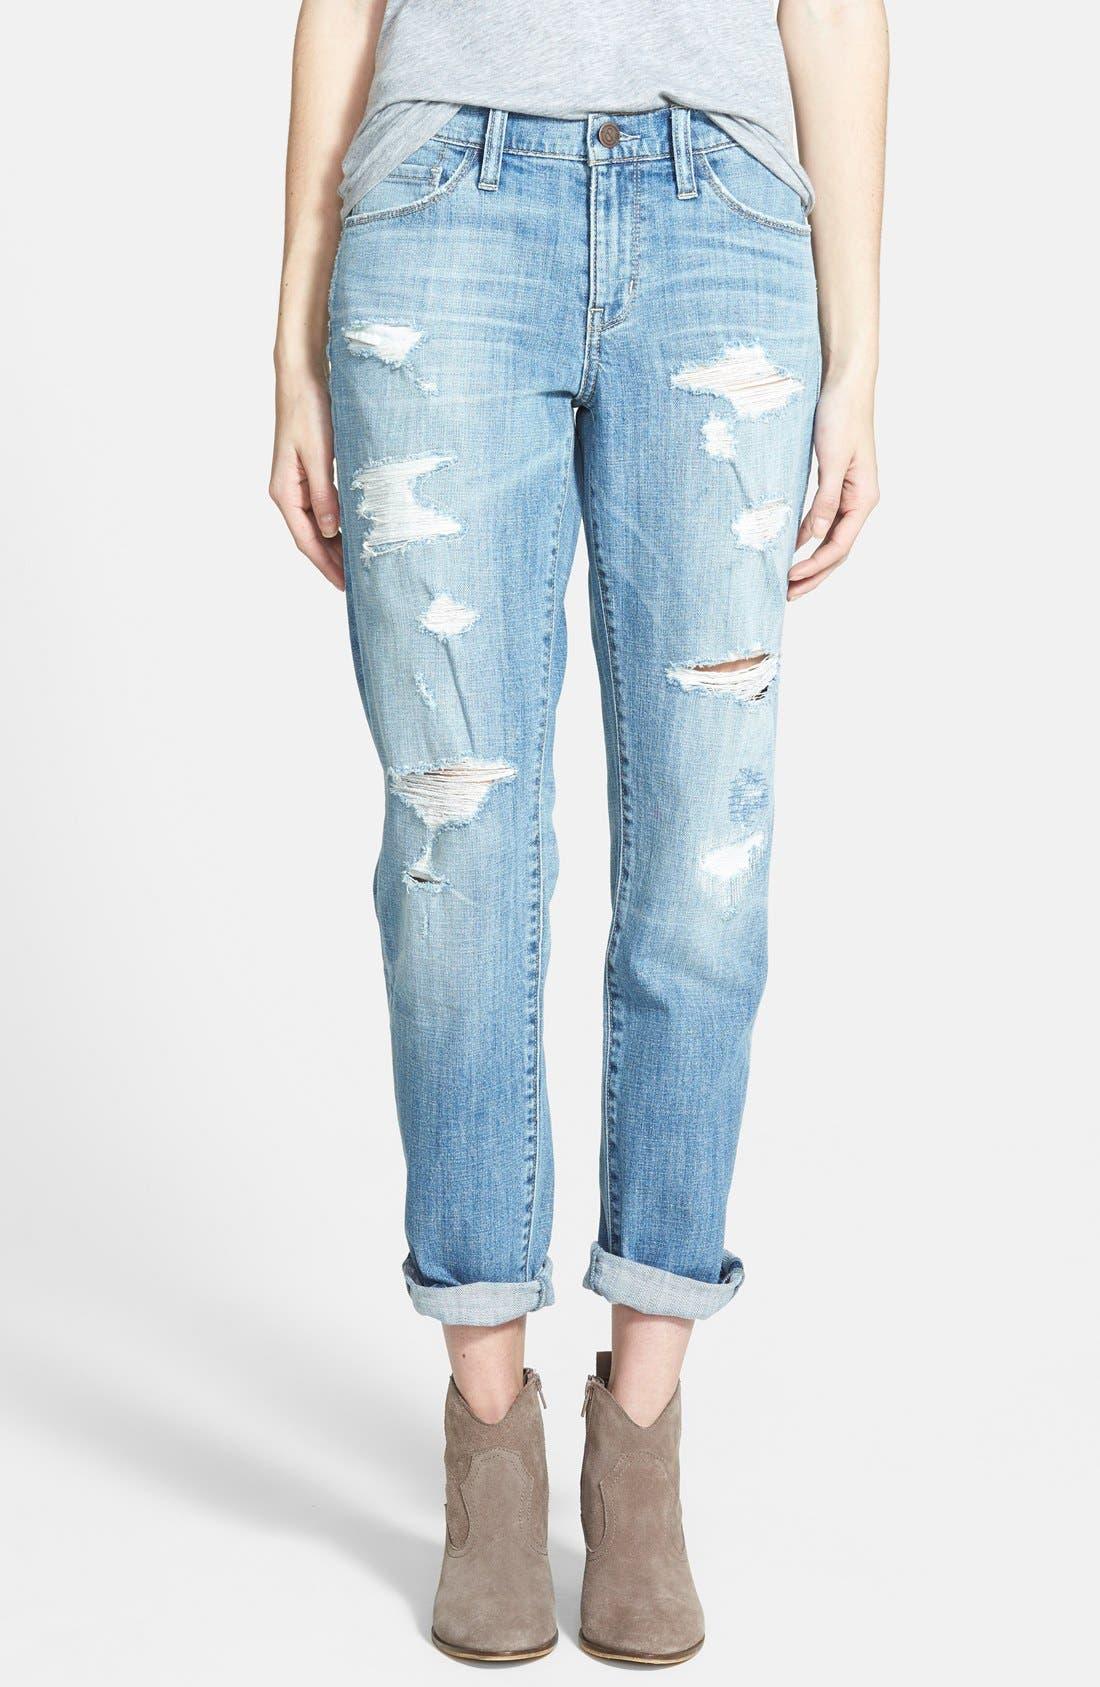 Main Image - Treasure&Bond Destructed Boyfriend Jeans (Blue Jay Light Rip & Repair)